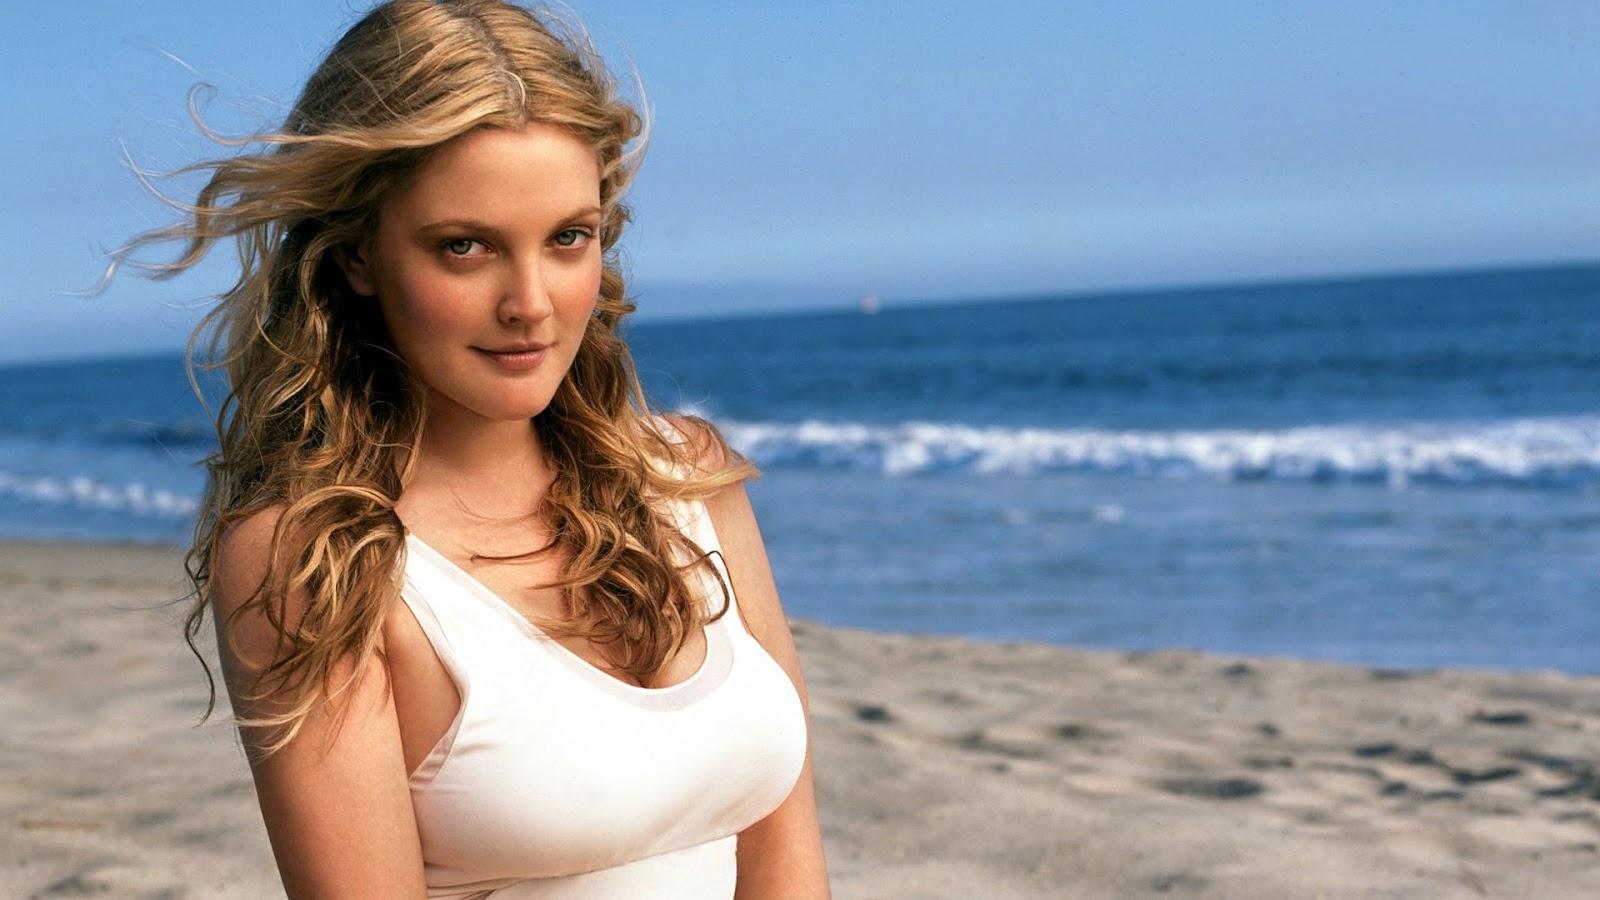 Drew Barrymore at Beach